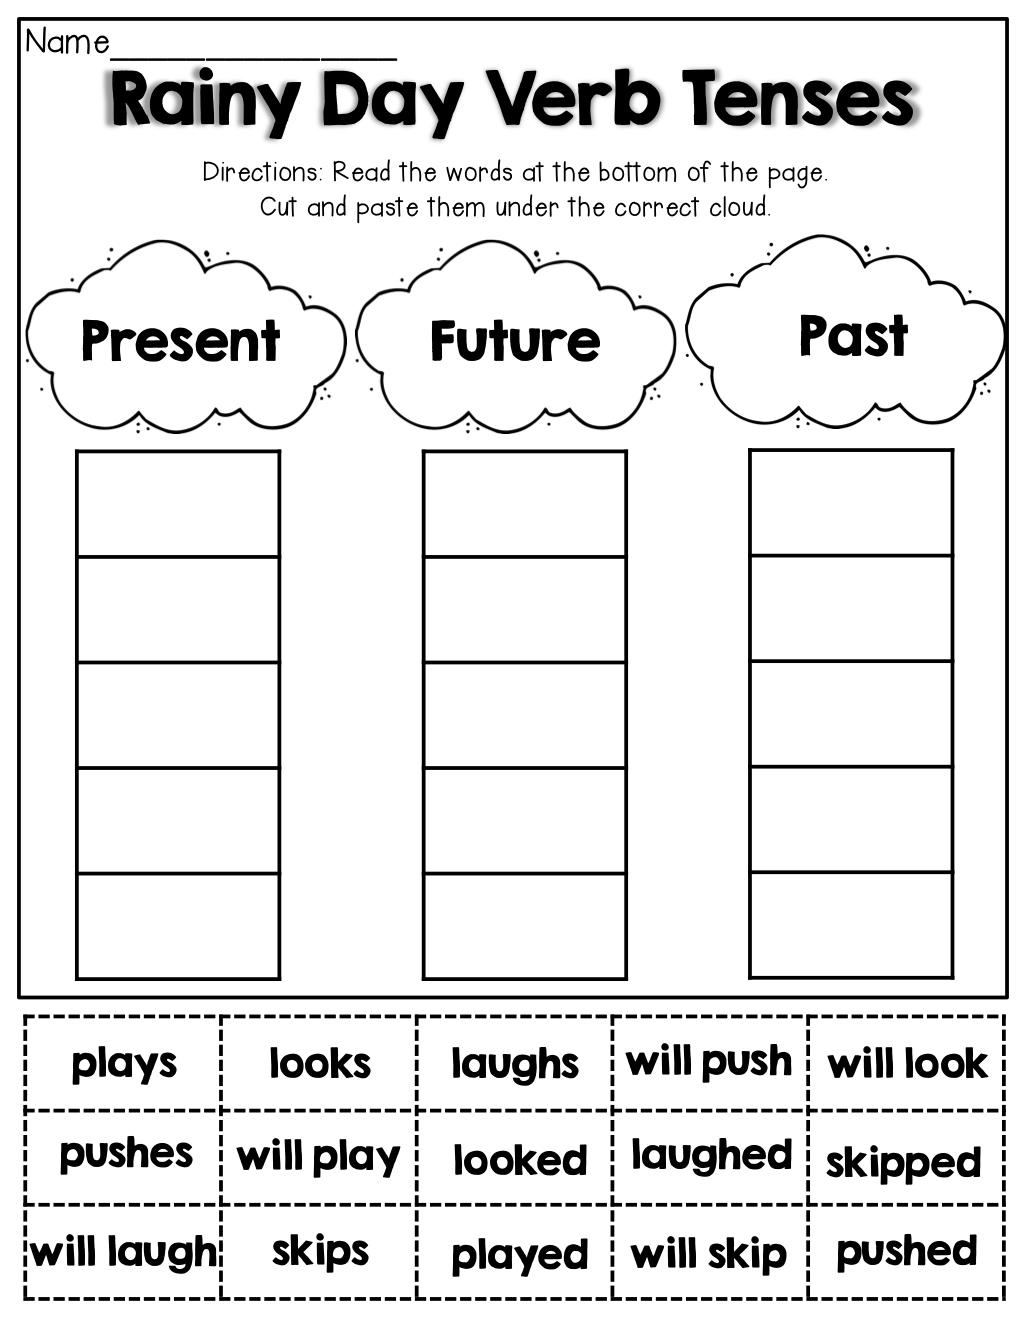 verb tenses cut and paste 1st grade activities englischunterricht englisch lesen. Black Bedroom Furniture Sets. Home Design Ideas